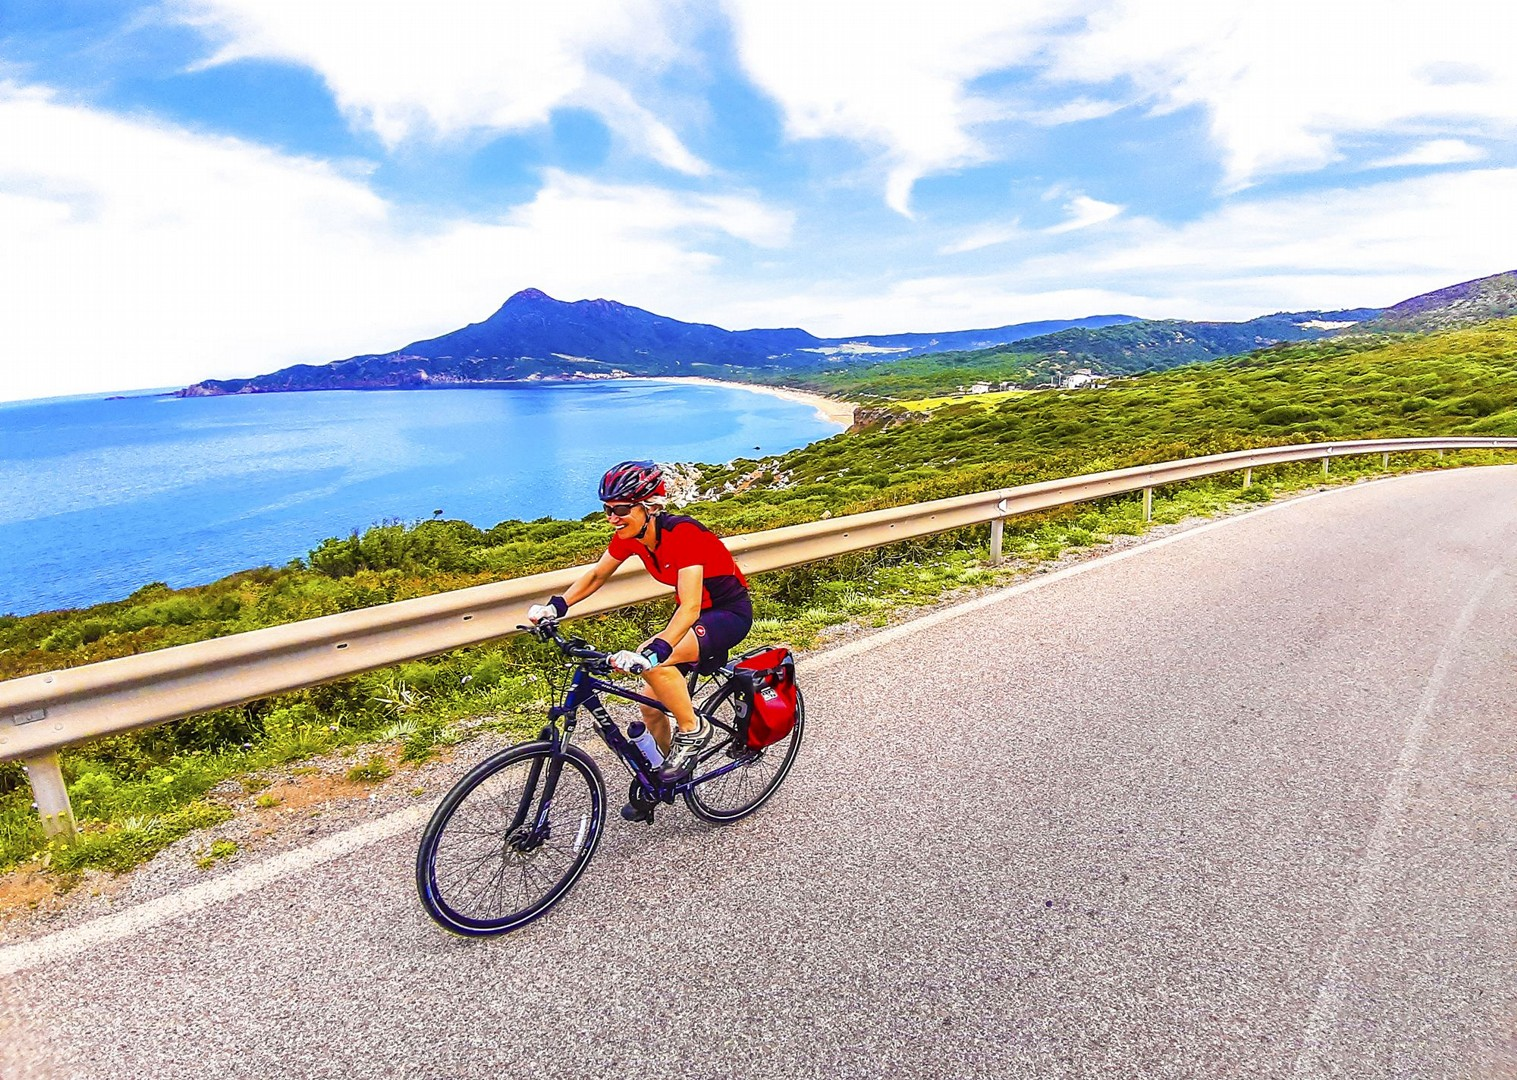 ddfsdf.jpg - Italy - Sardinia - Island Flavours - Italia Leisure and Family Cycling